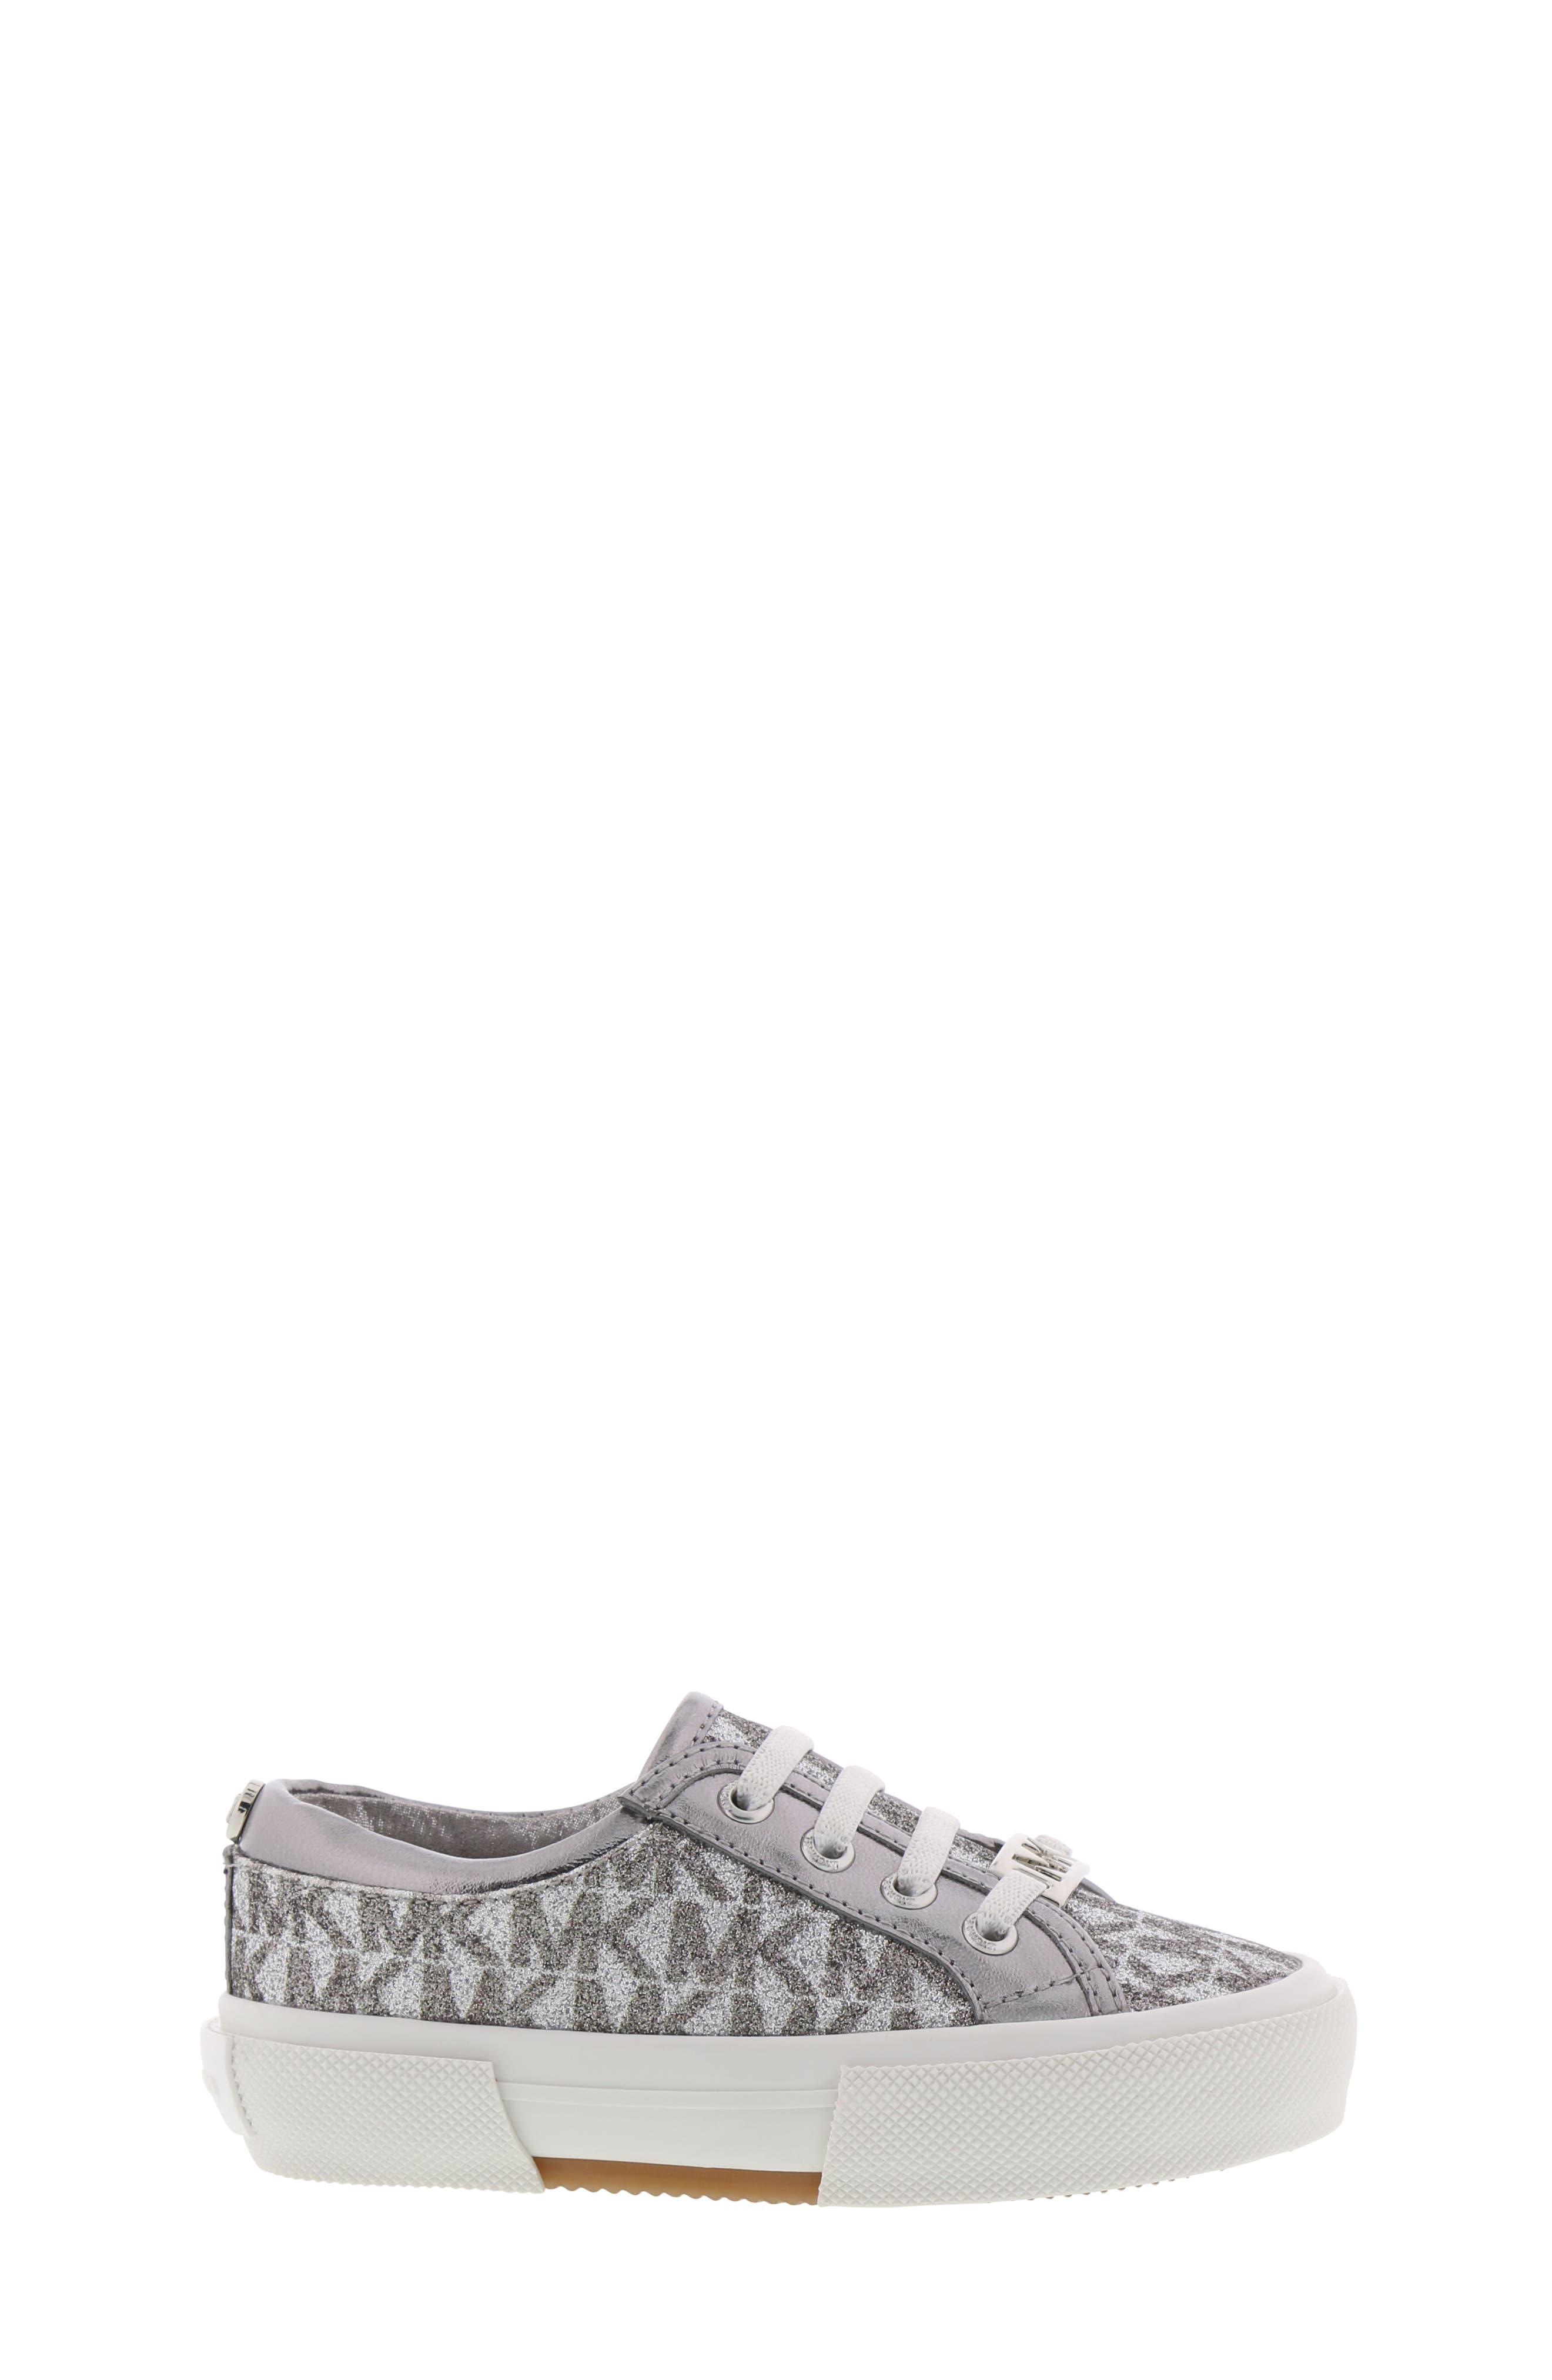 MICHAEL MICHAEL KORS,                             Ima Tinsel Sneaker,                             Alternate thumbnail 3, color,                             GUNMETAL